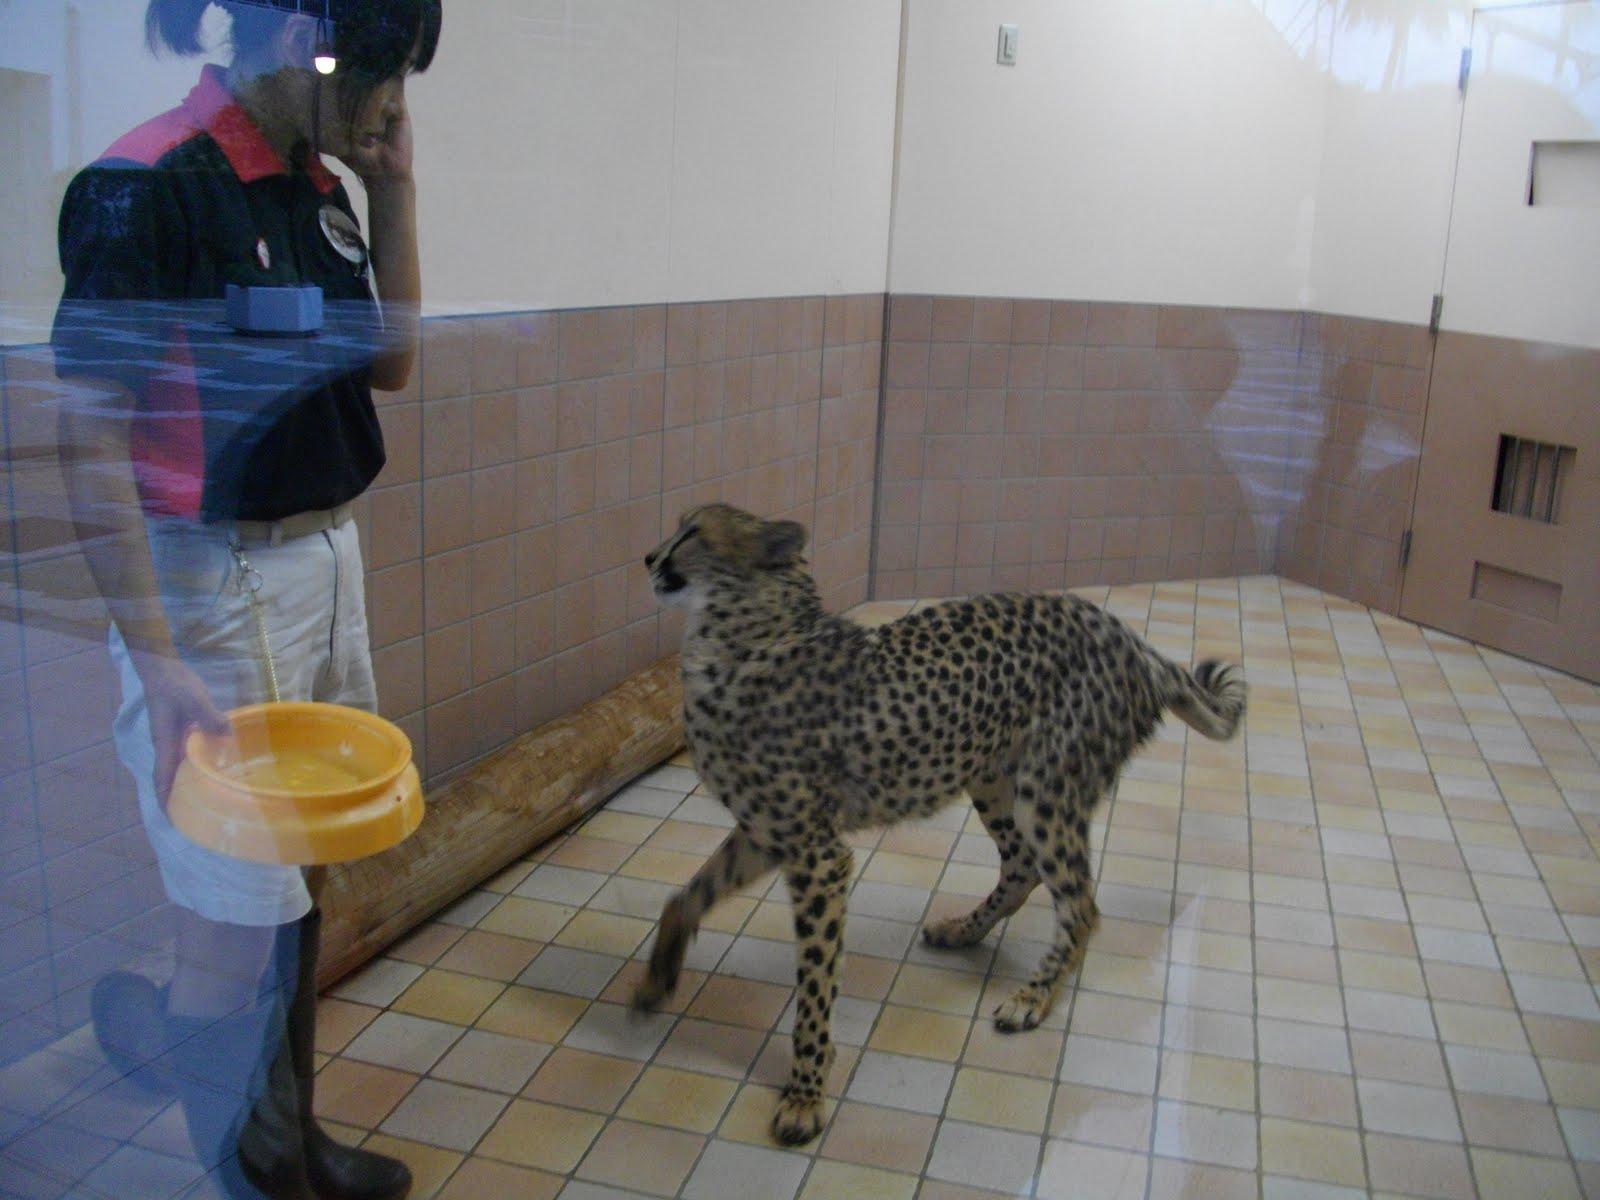 Affectionate Cheetahs HD Wallpapers ilikewall  - affectionate cheetahs wallpapers